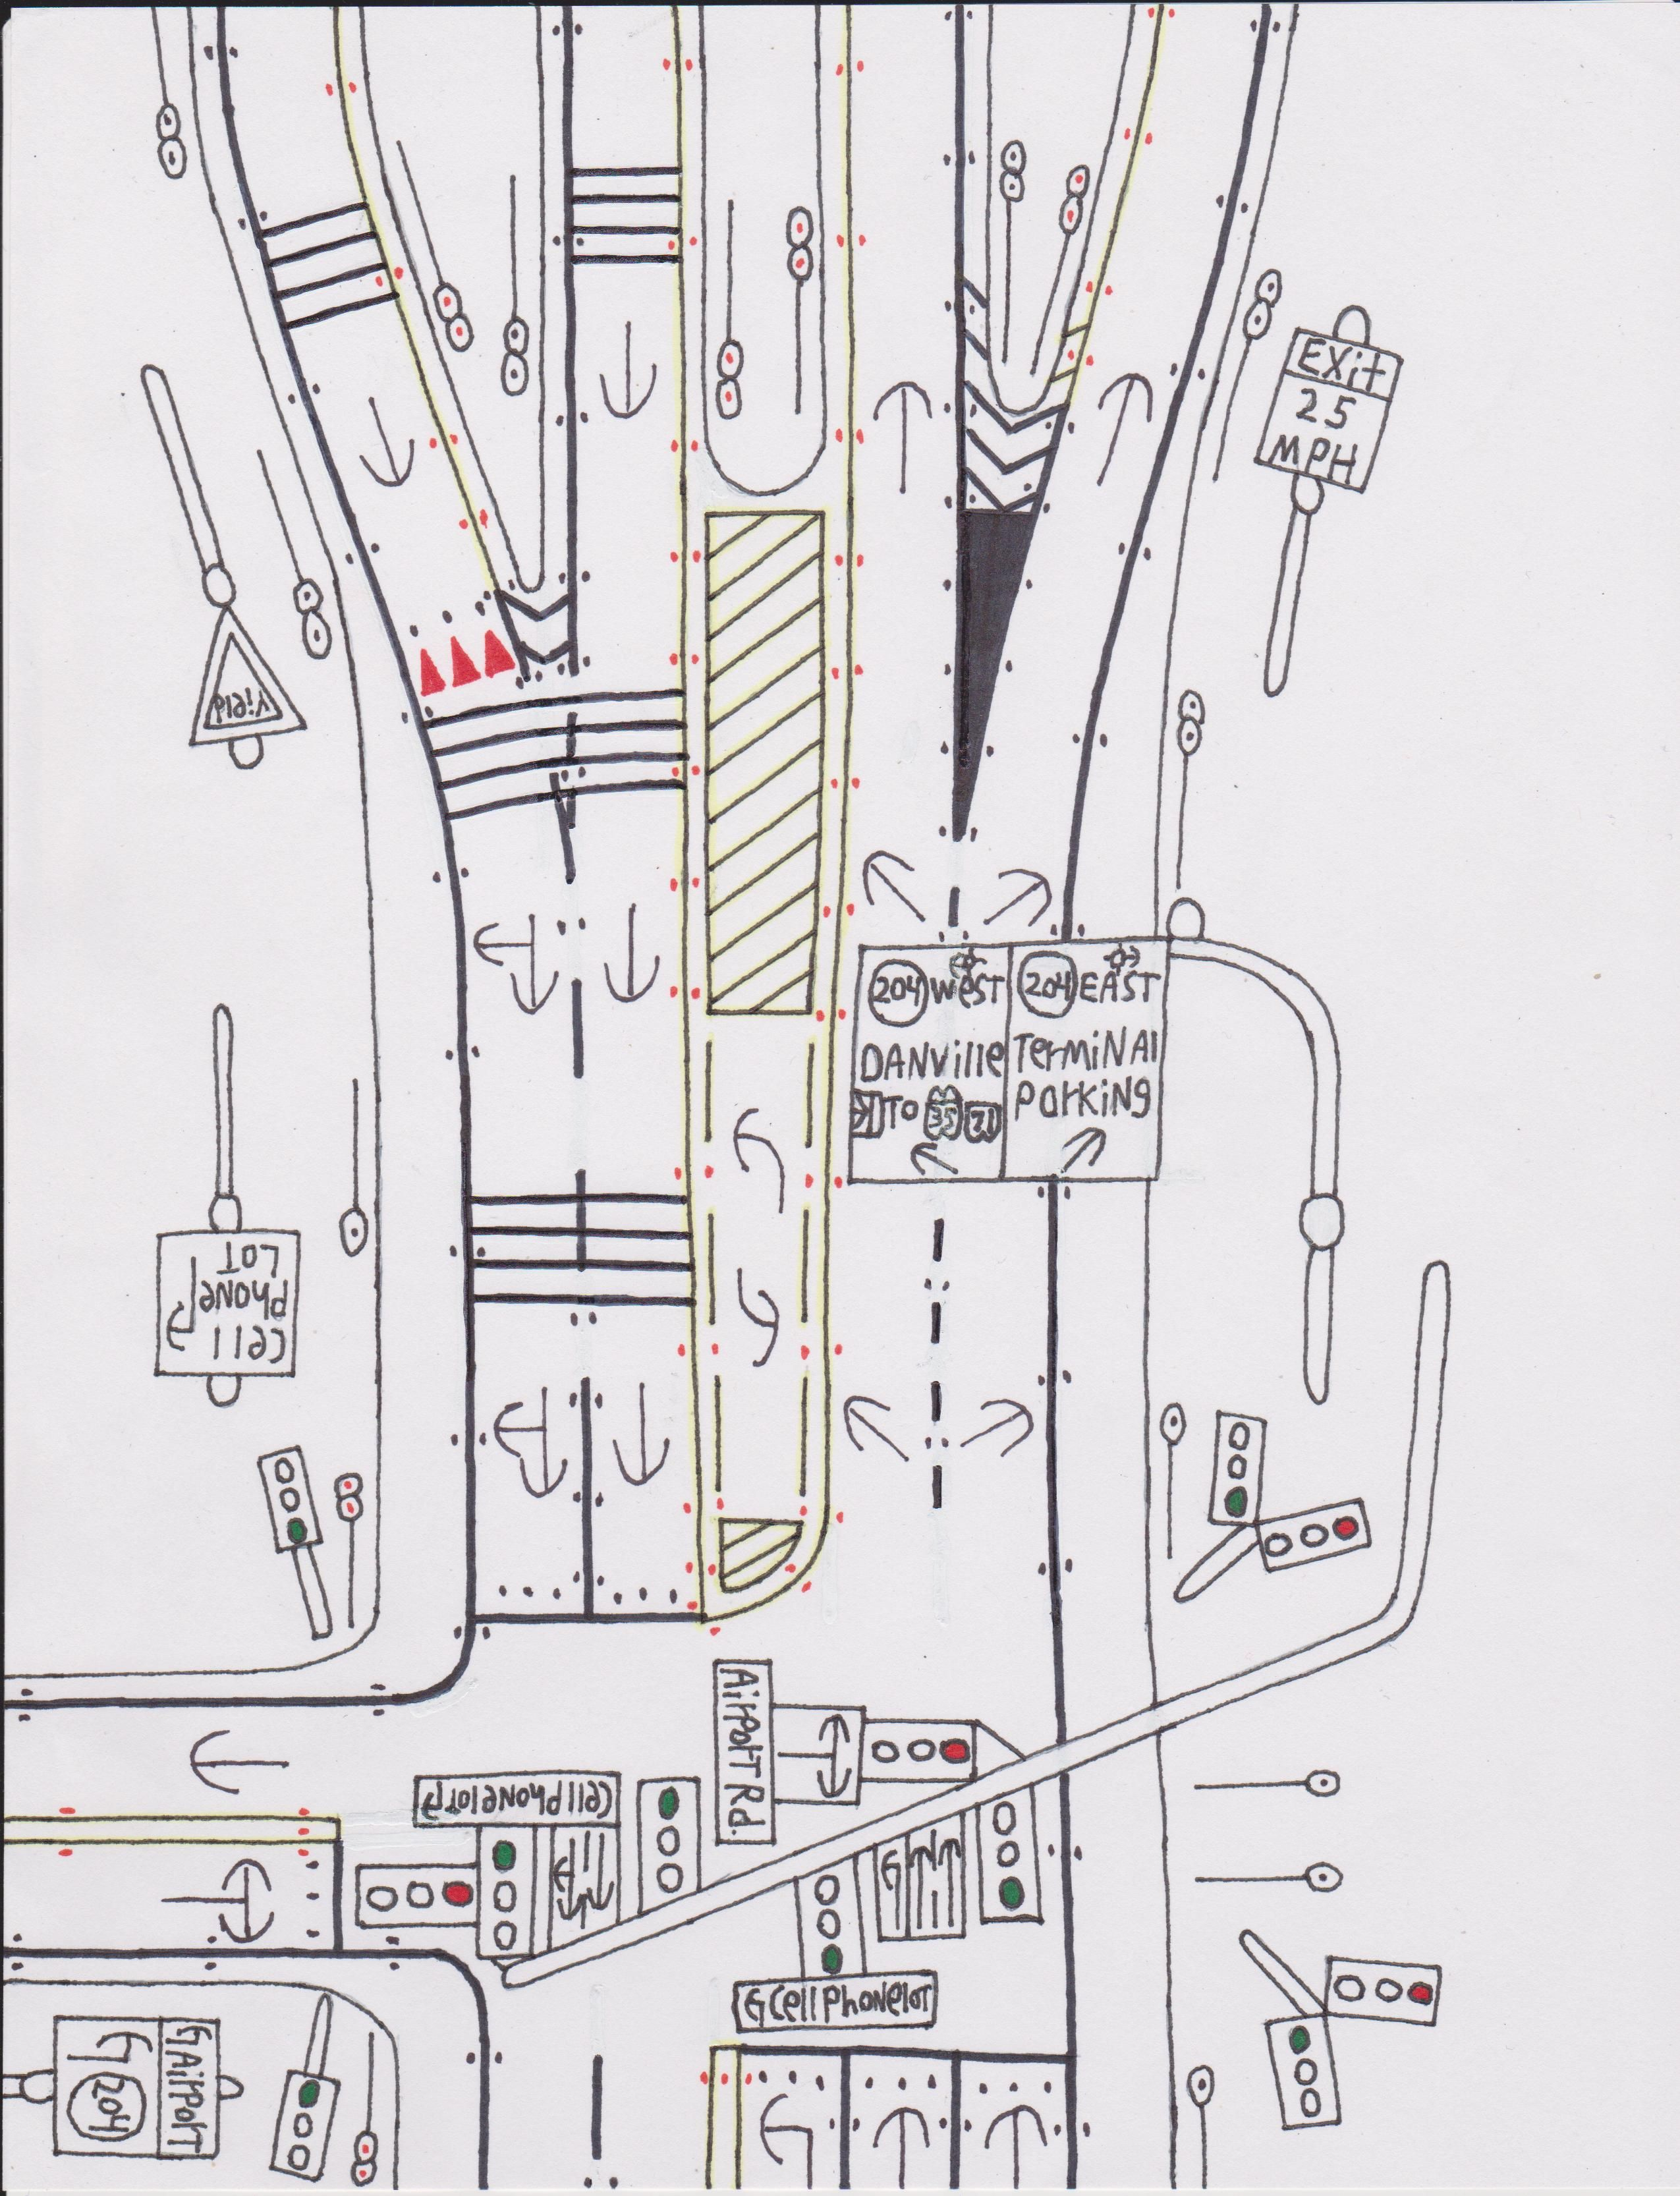 Traffic light on an avenue. | Road Drawings Stuff | Pinterest ...